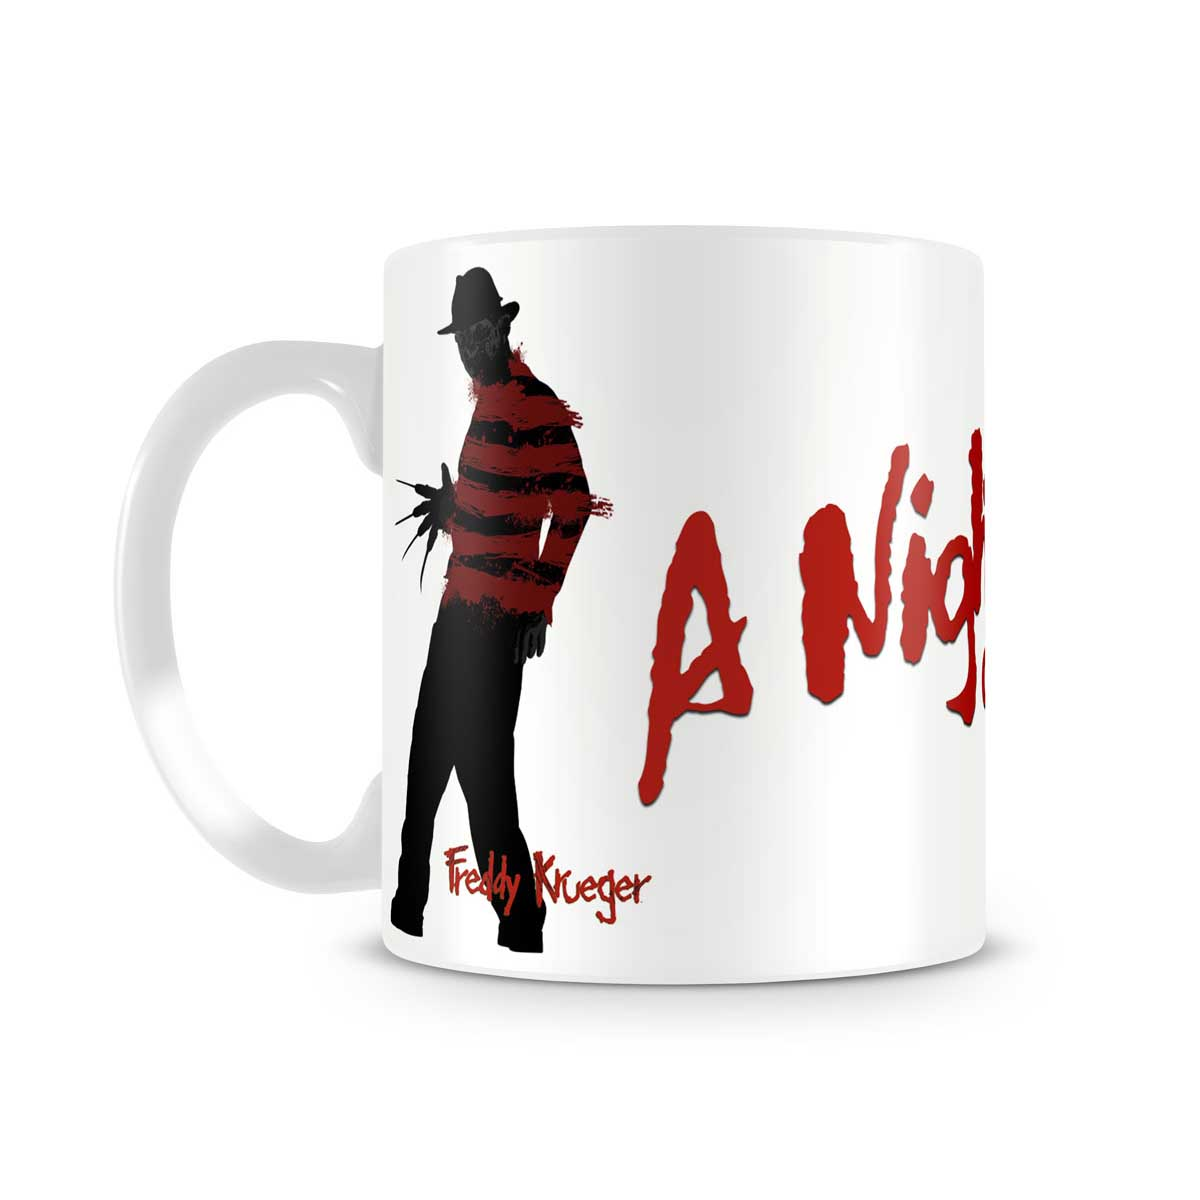 Mugg, Freddy Krueger a nightmare on Elm street